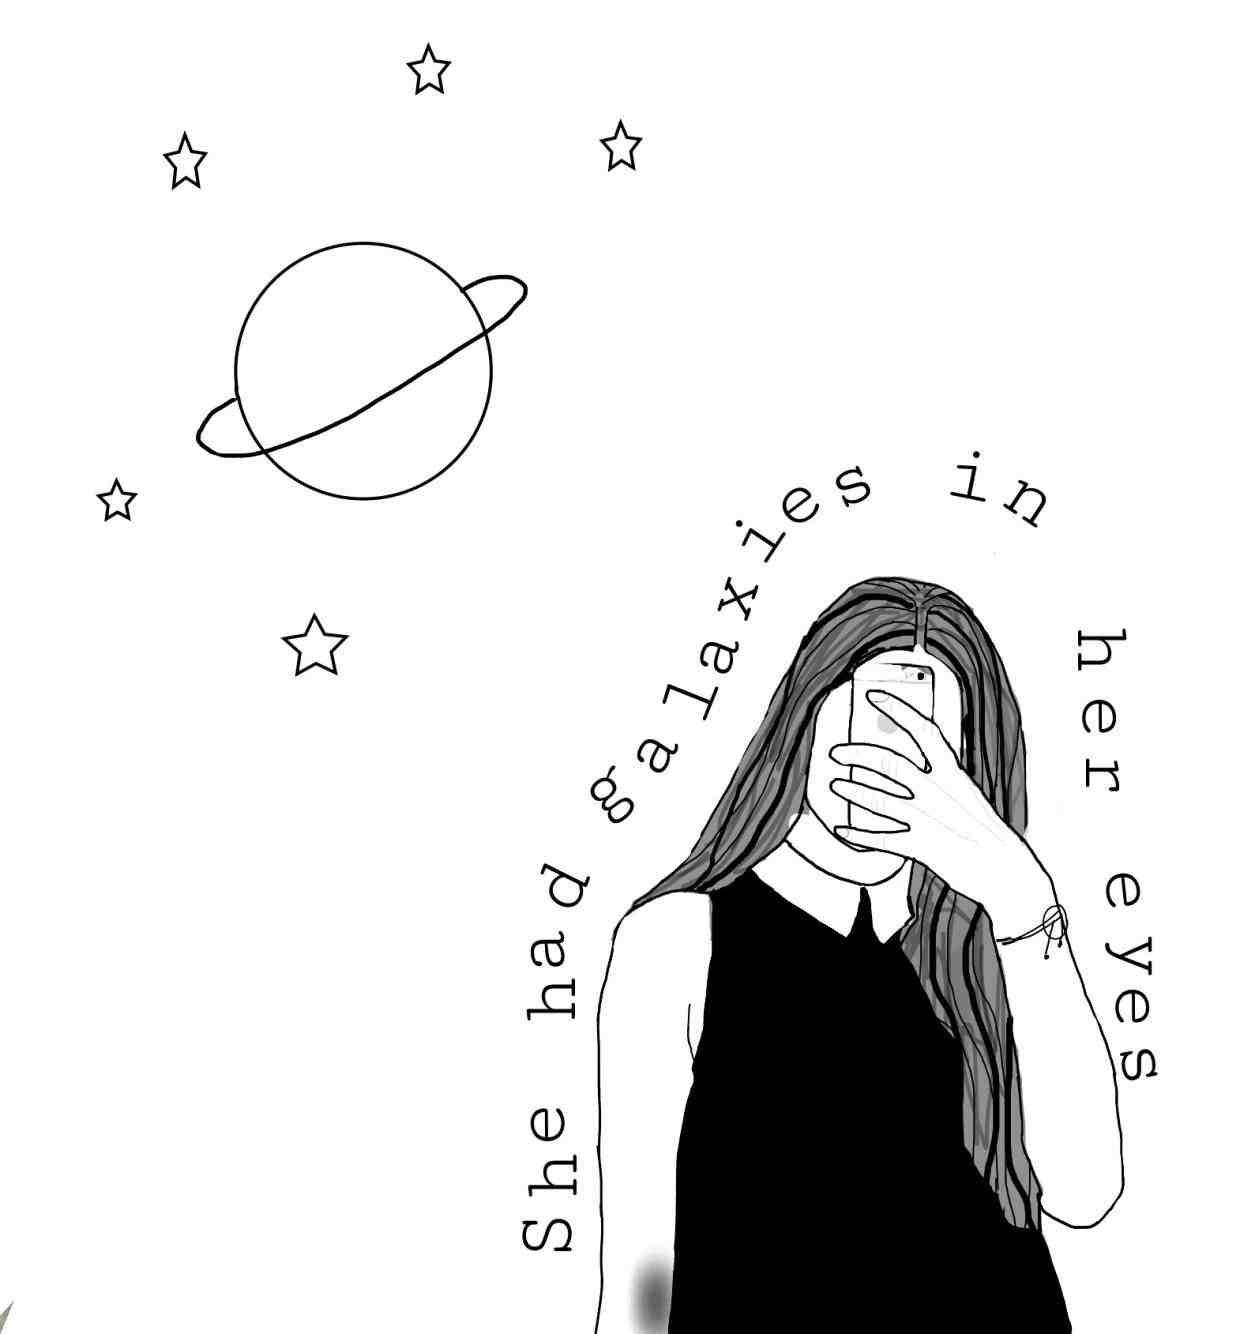 Sad Tumblr Aesthetic Monsters Drawings Www Topsimages Com